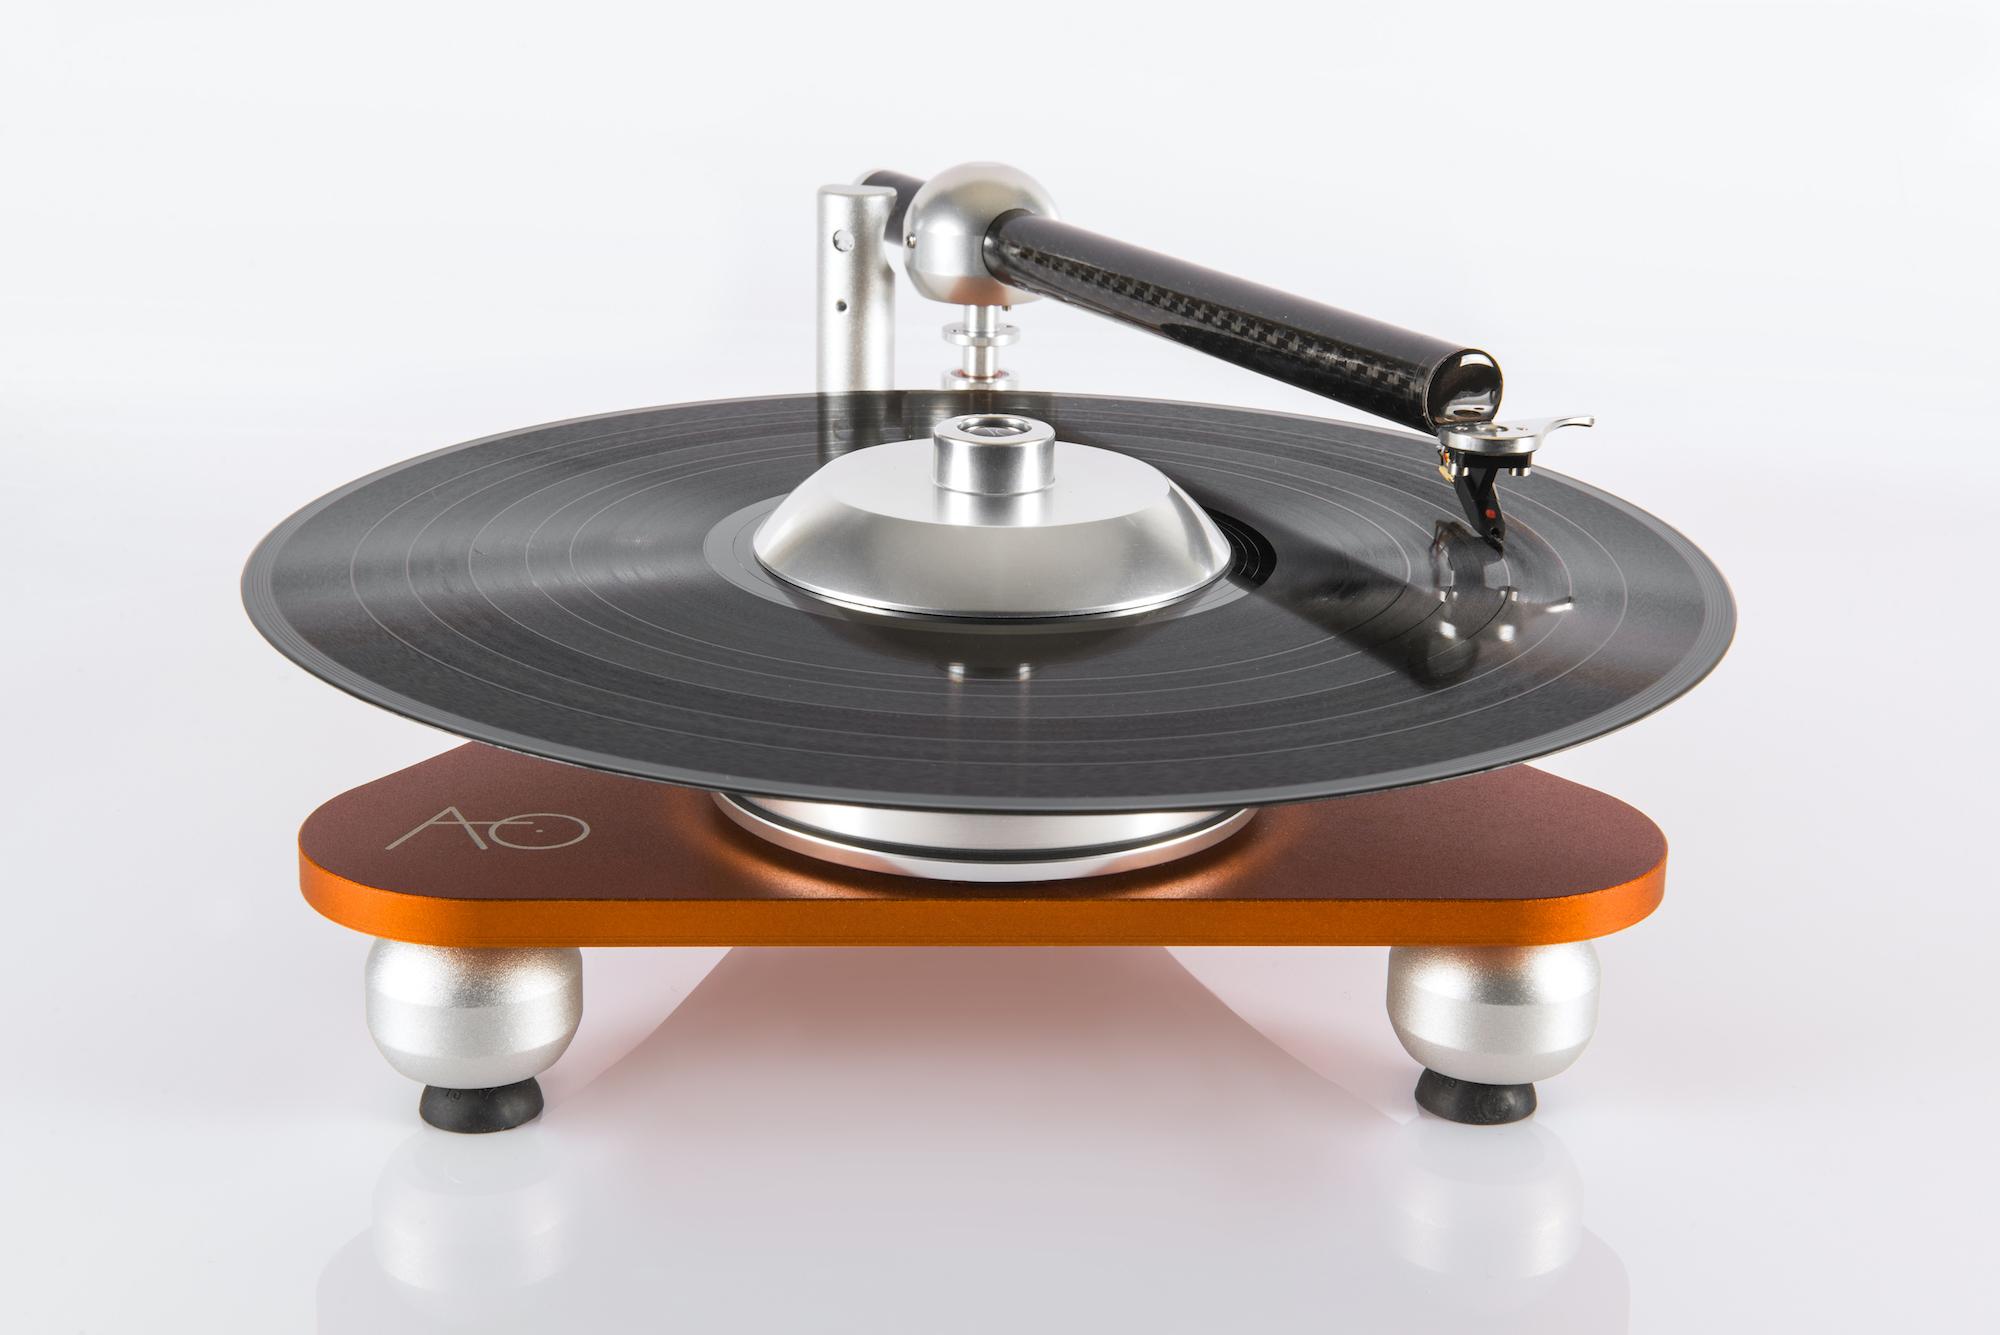 Atmo Sfera Platterless Turntable has no traditional platter